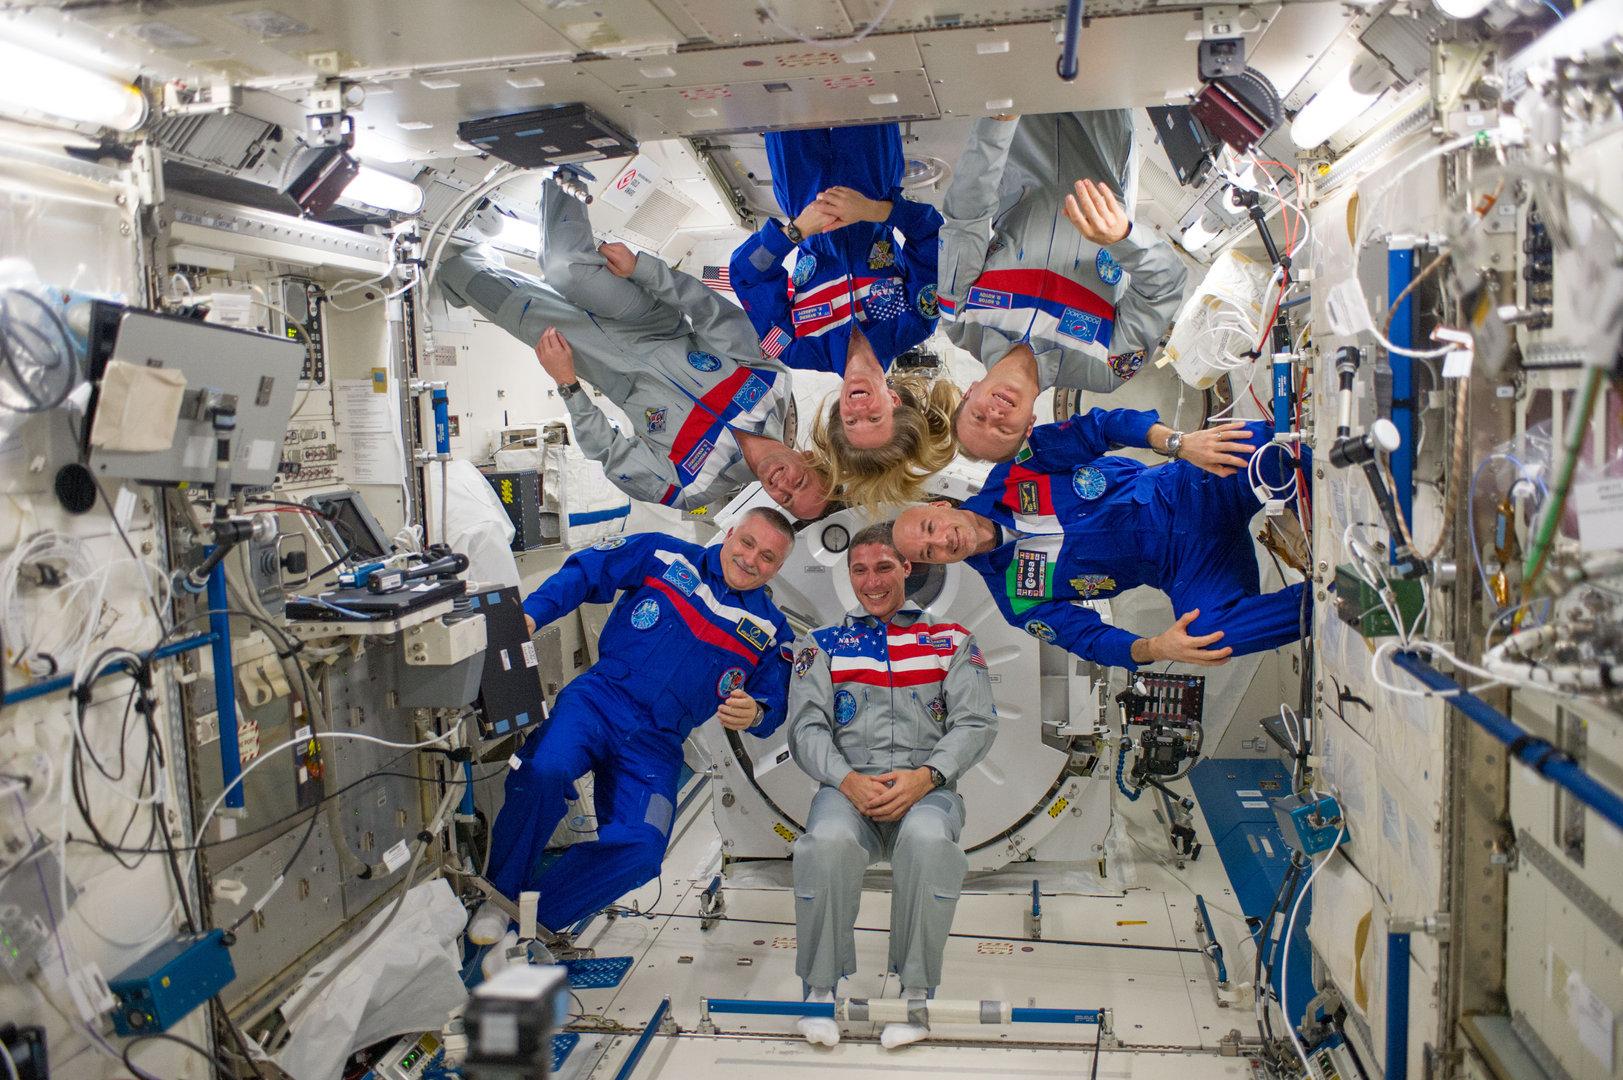 ISS_Expedition_37_crew_portrait_inside_Kibo_pillars.jpg